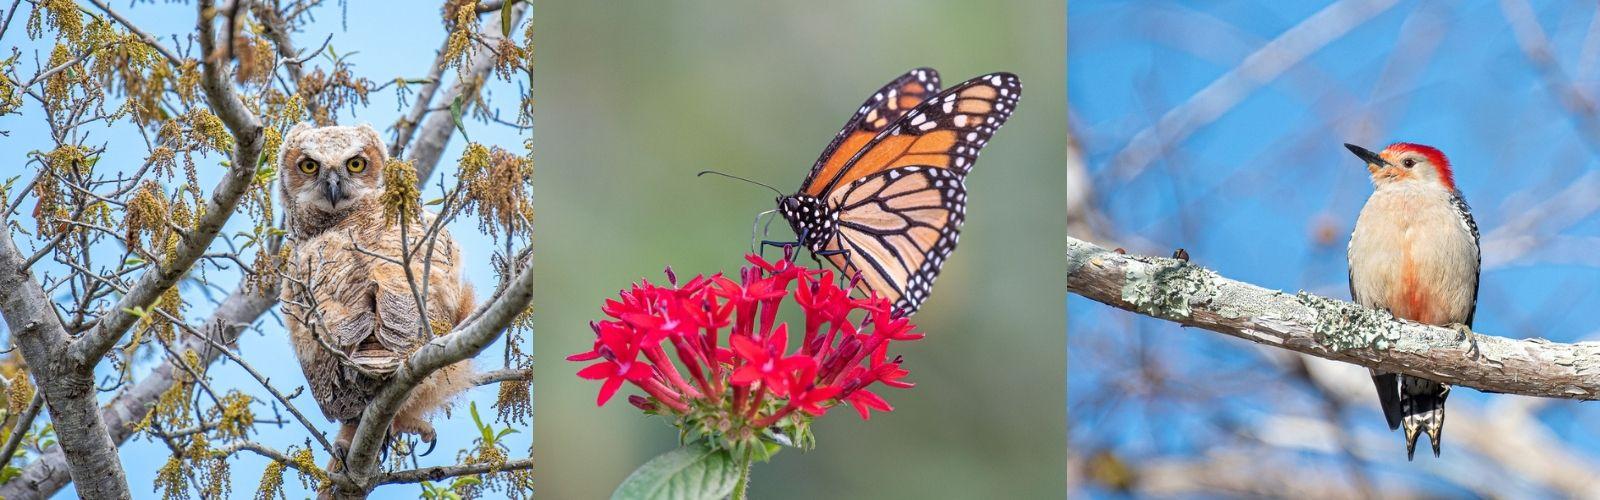 Meet Lois Fraser- Your Resident Nature Photographer